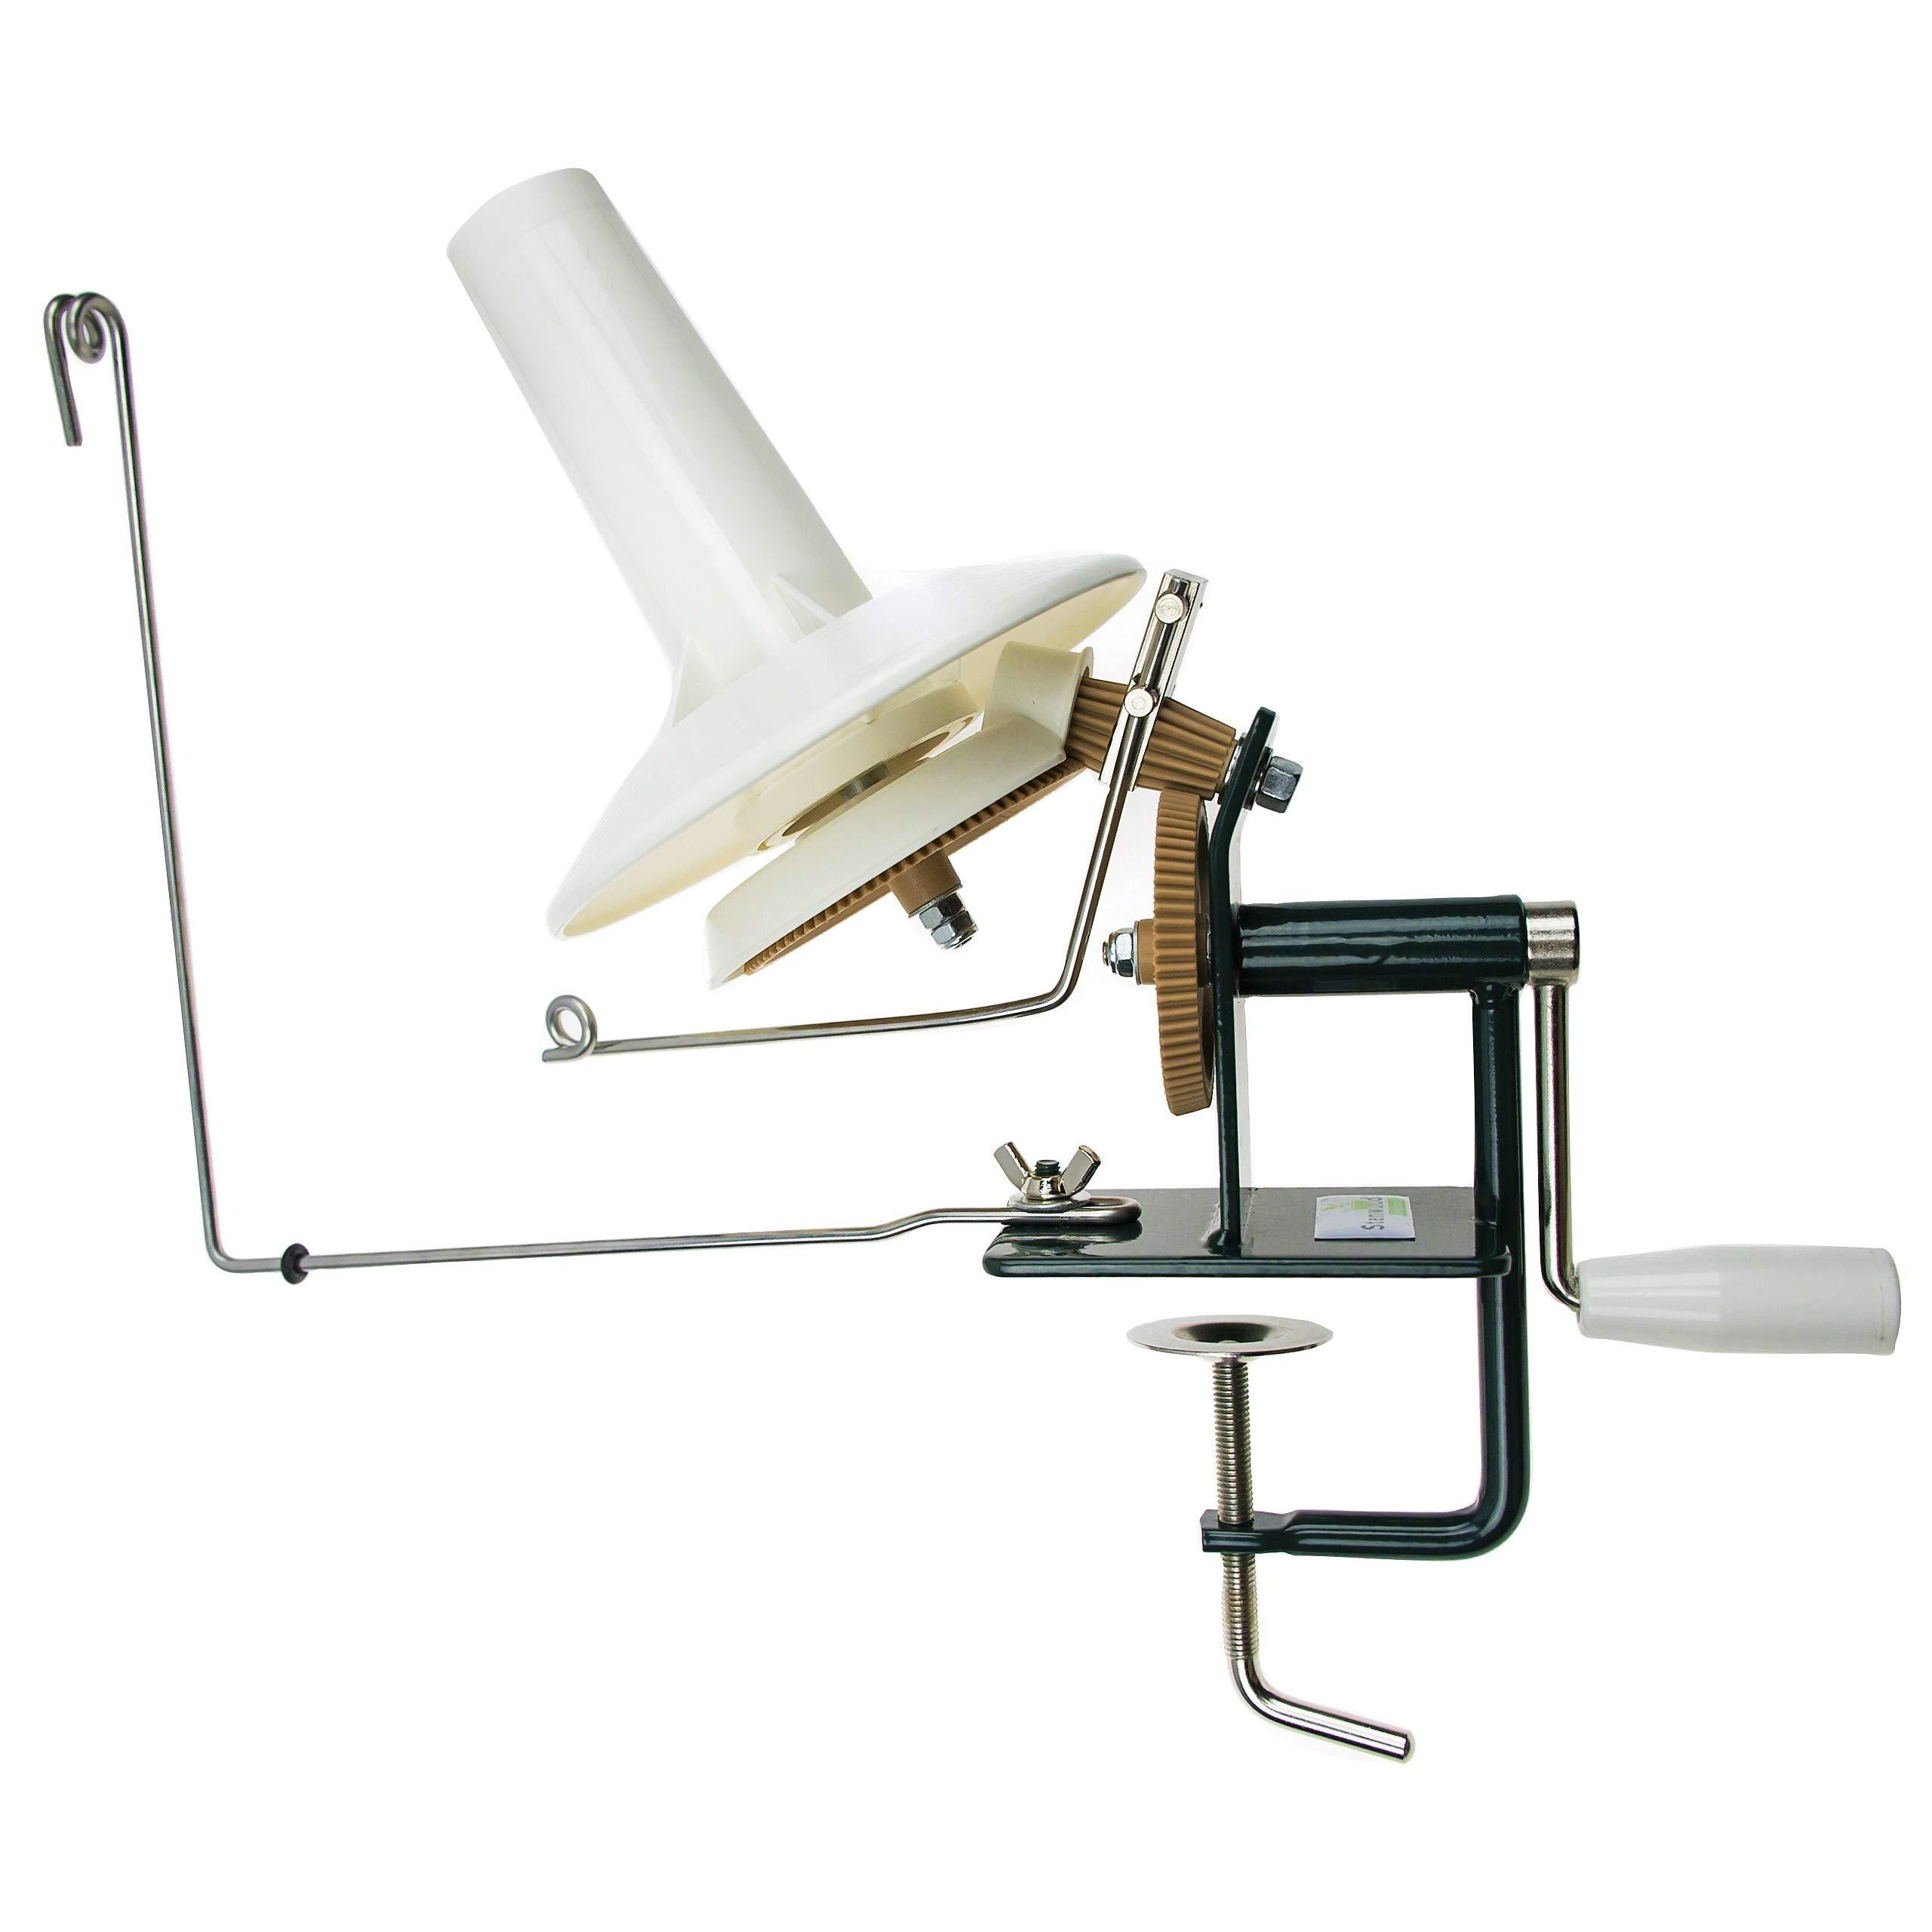 Stanwood Needlecraft Large Metal Yarn/Fiber/Wool/String Ball Winder, 10-Ounce by Stanwood Needlecraft (Image #1)